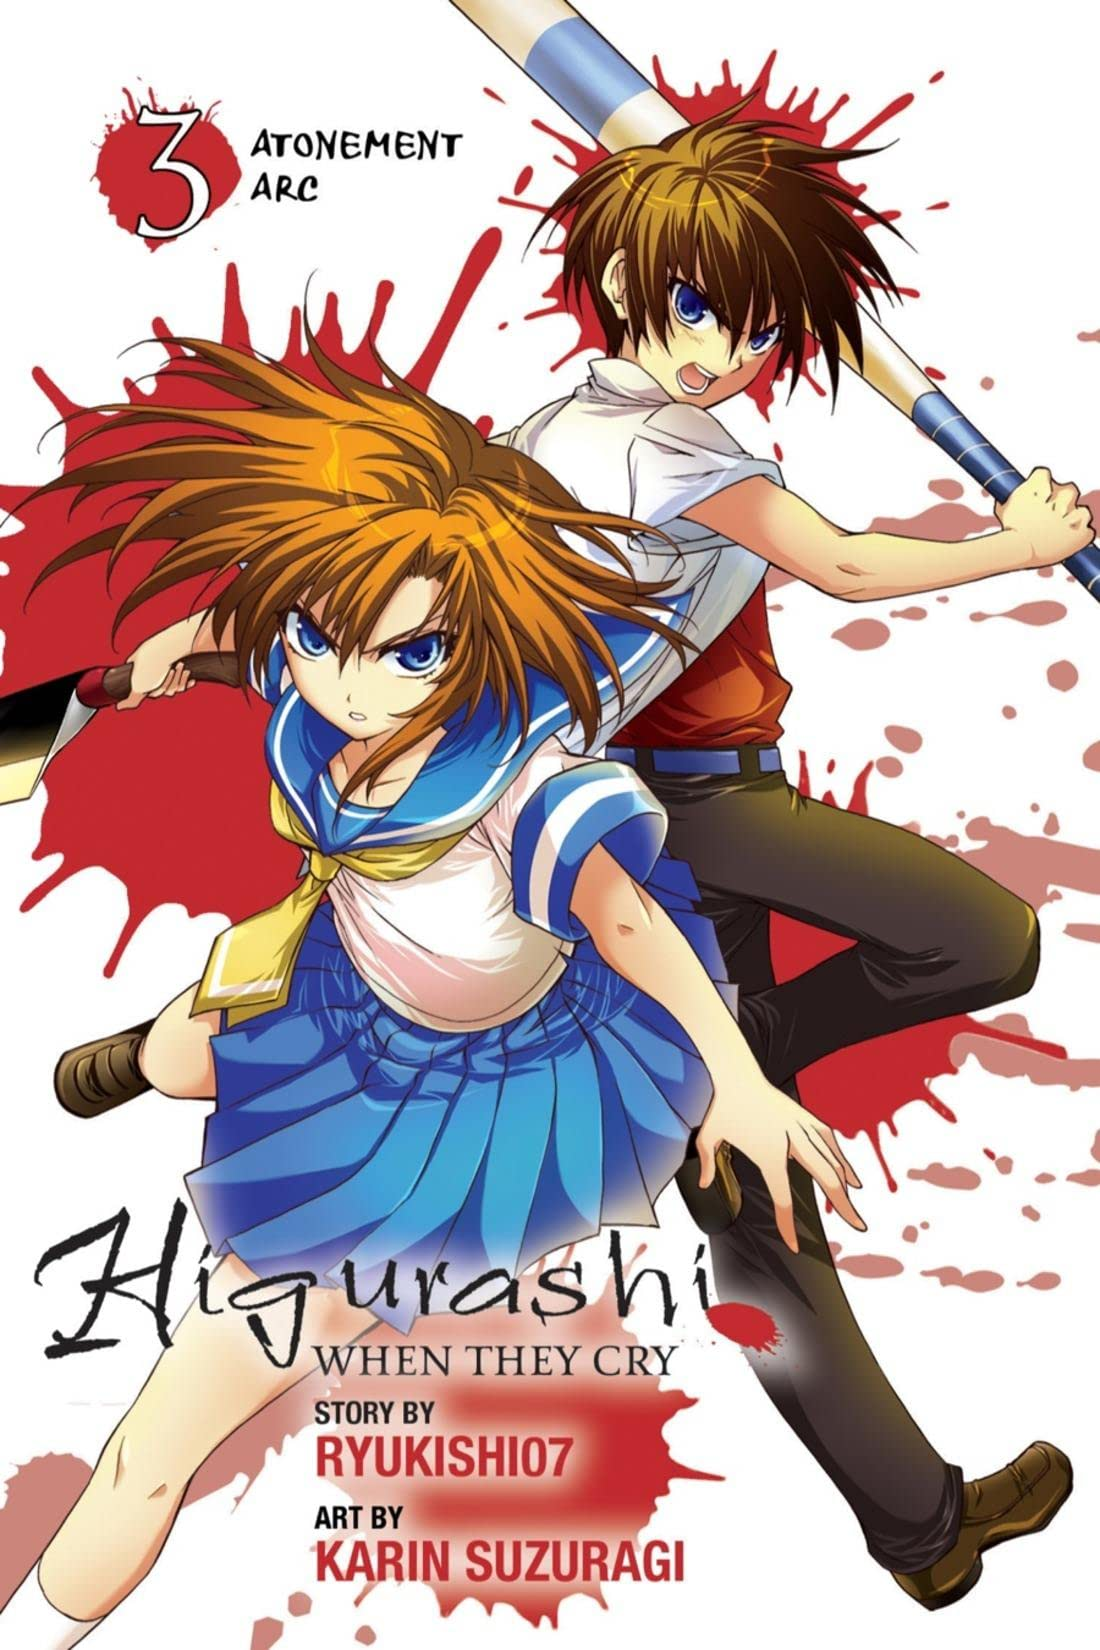 Higurashi When They Cry Vol. 3: Atonement Arc